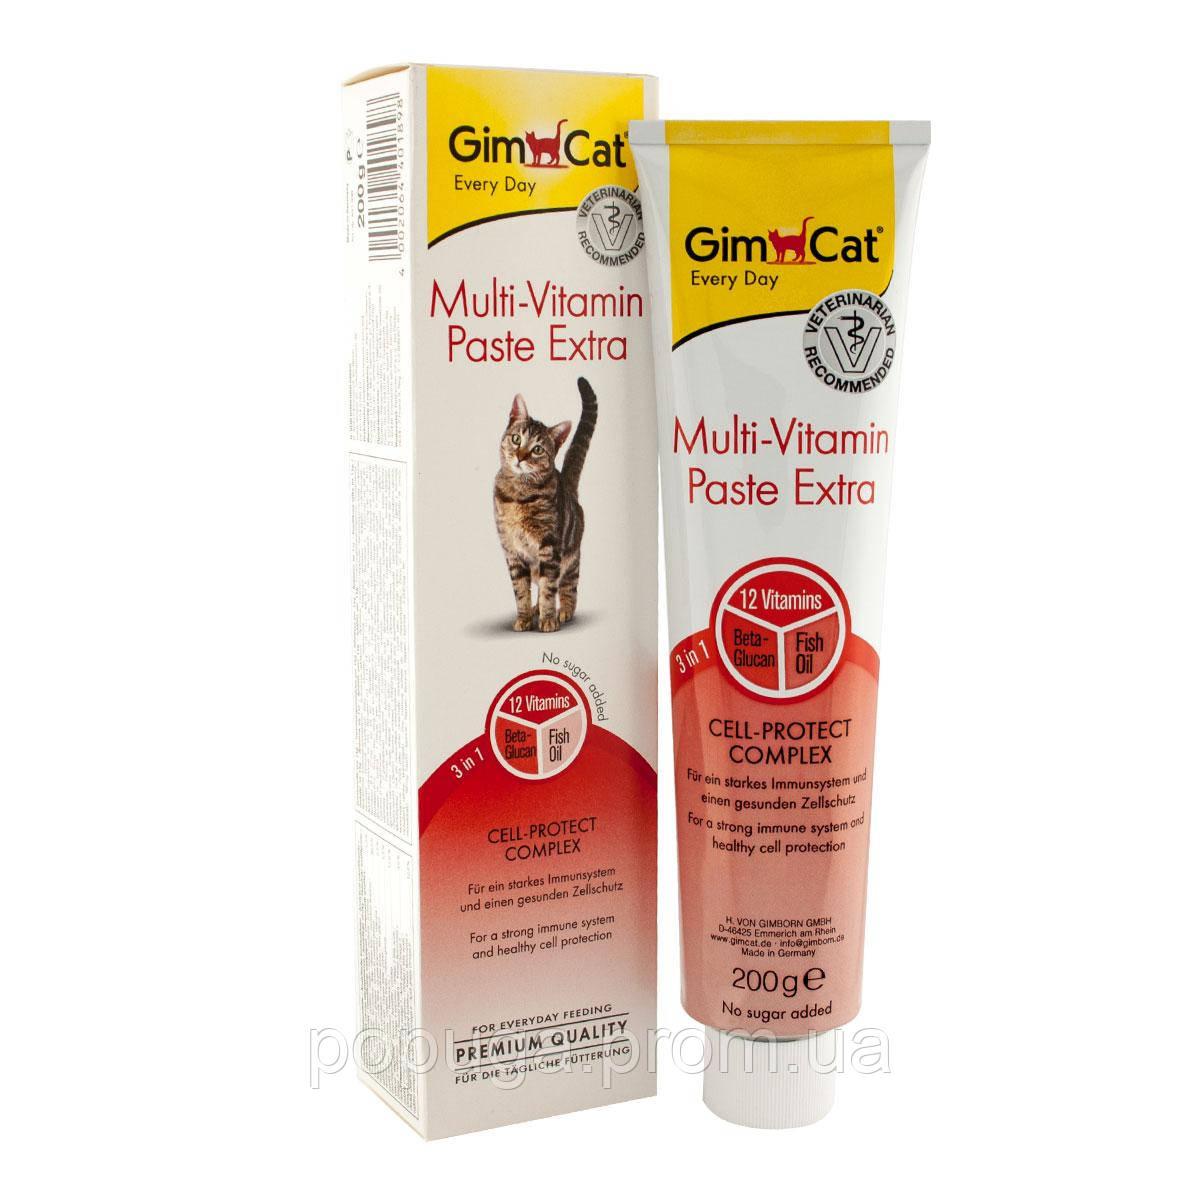 Gimсat Multi-Vitamin Paste Extra мультивитаминная паста для кошек, 50 г